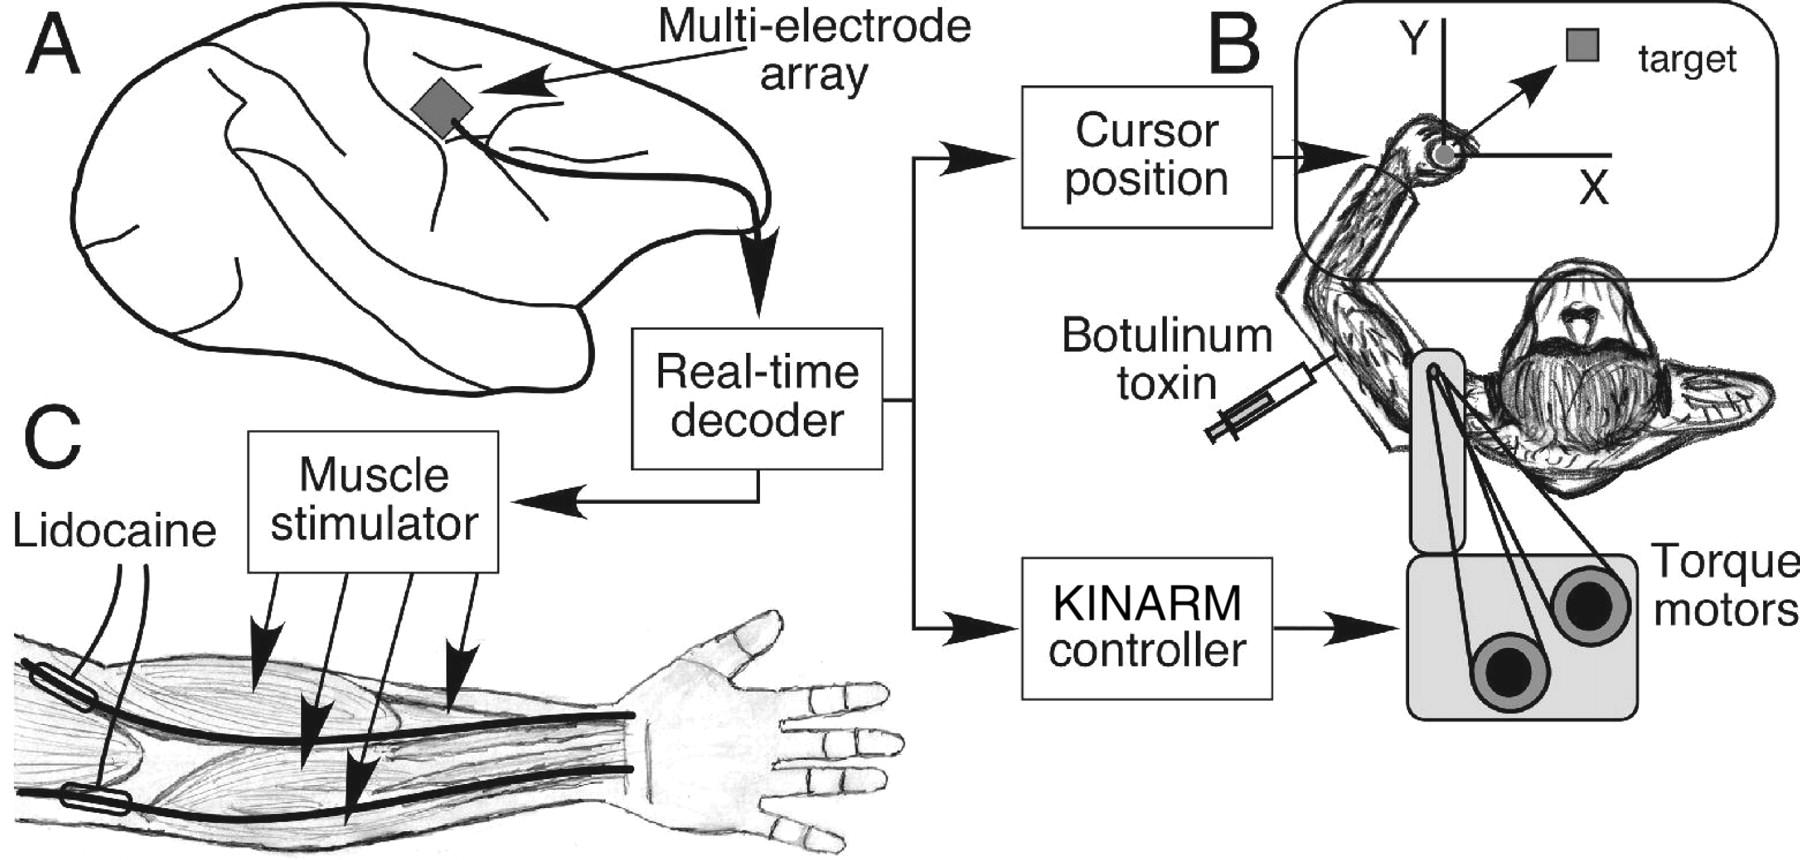 Biomimetic Brain Machine Interfaces For The Control Of Movement Block Diagram Egt Emg Cursor System Eye Gaze Download Figure